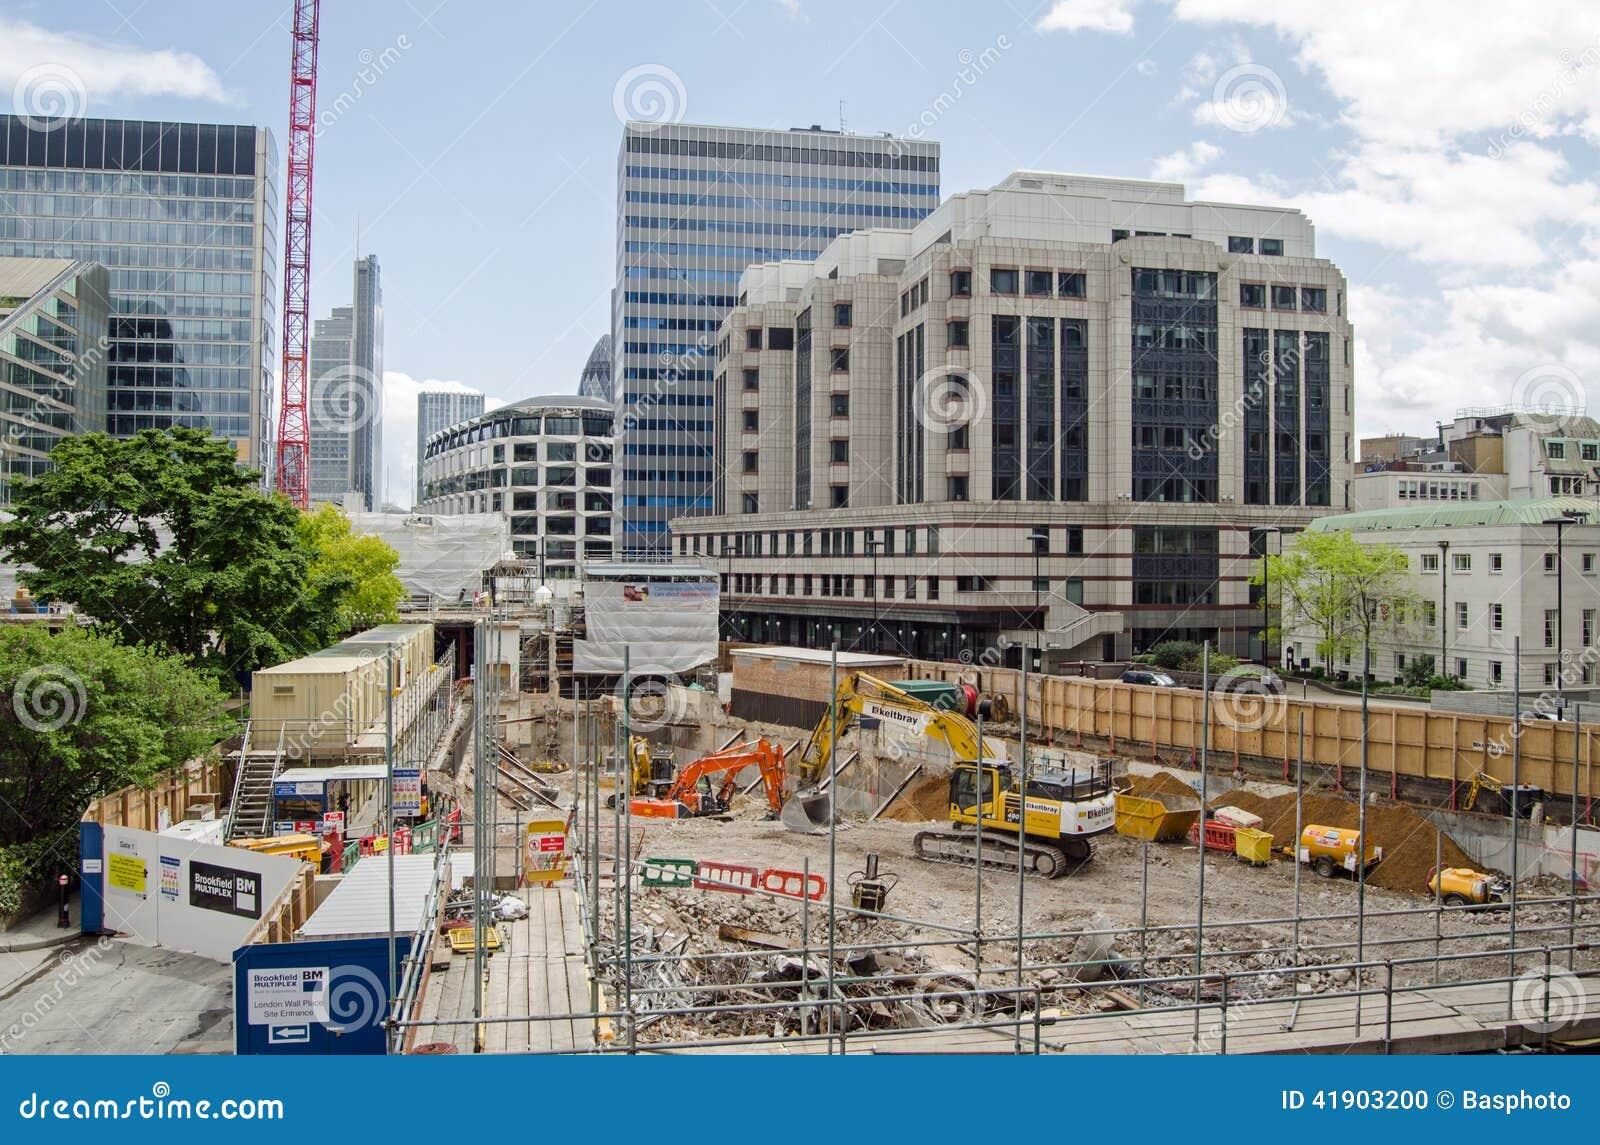 City of London building site